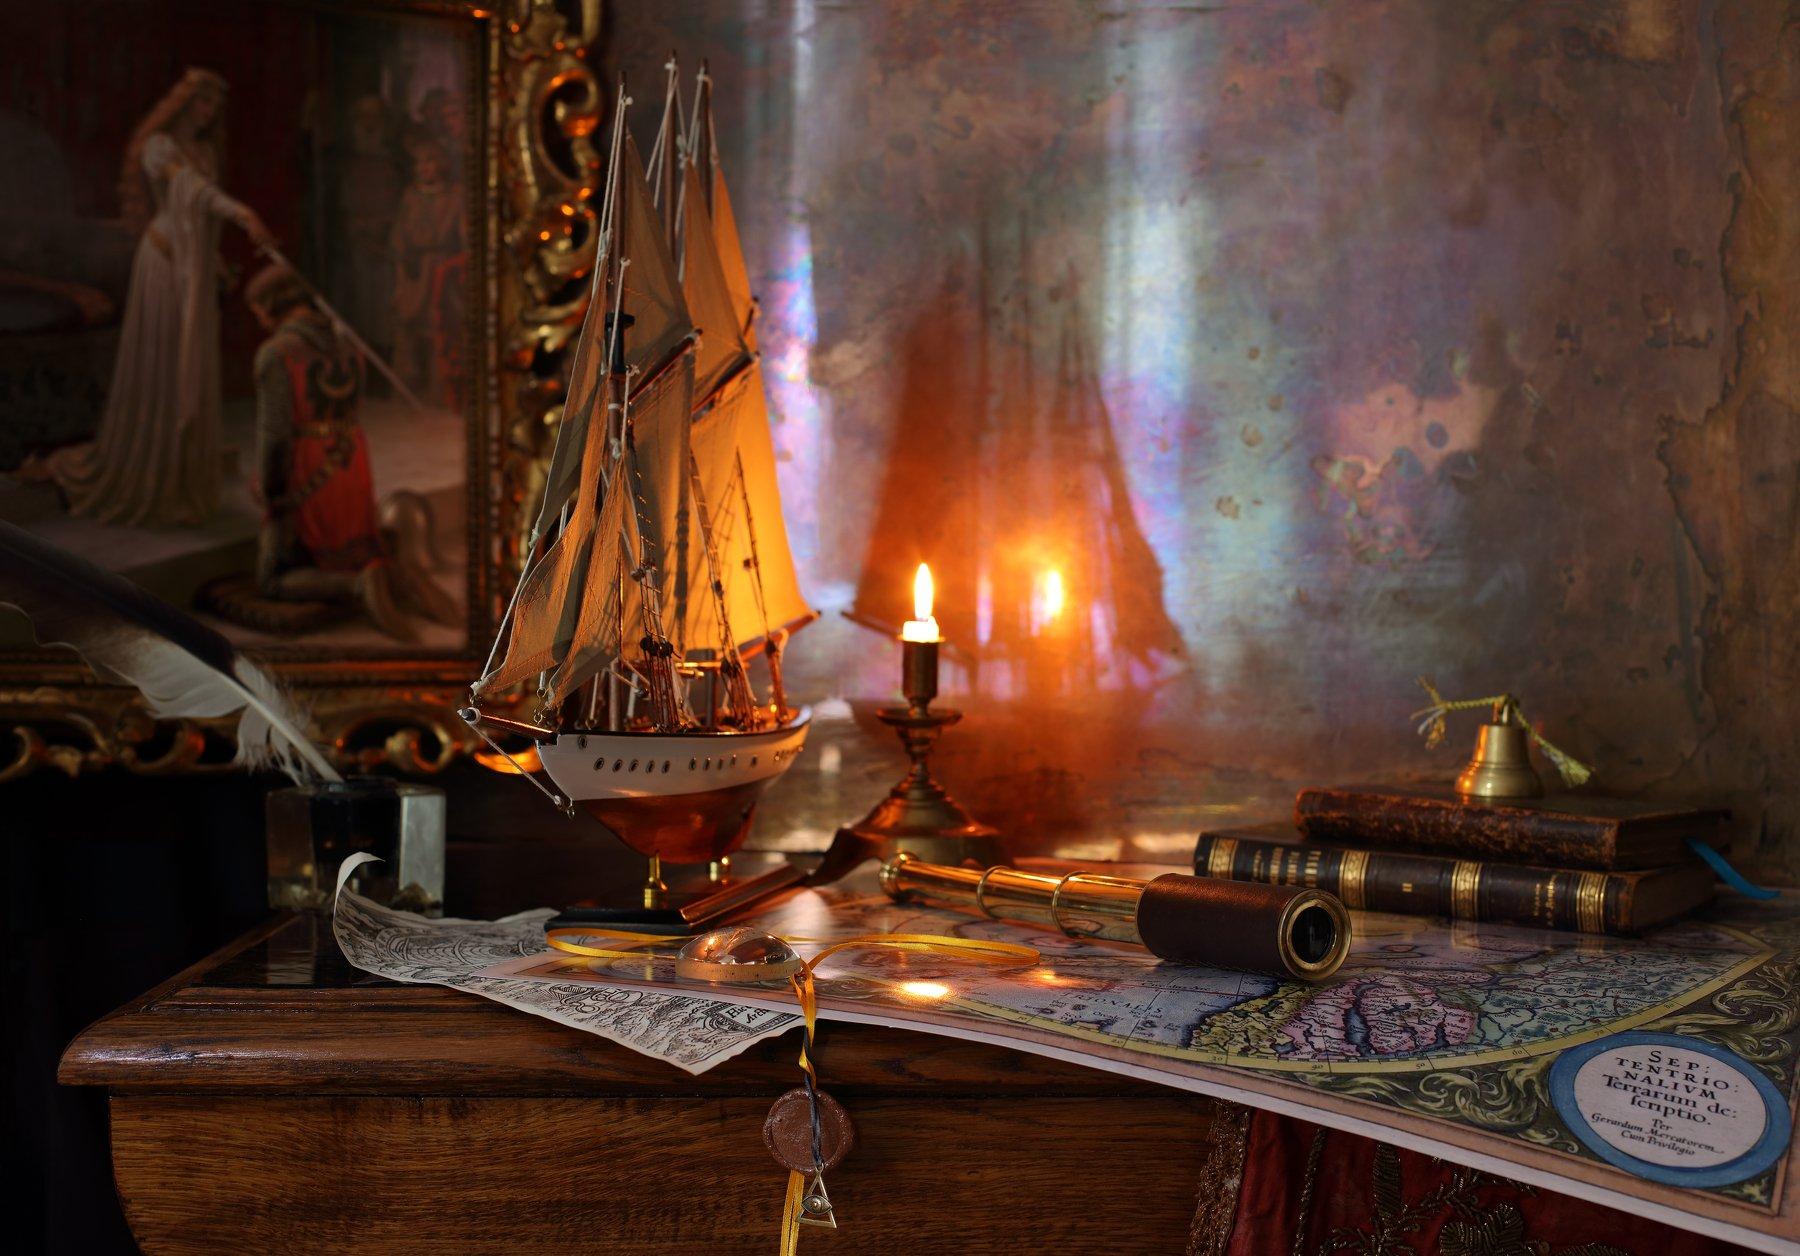 корабль, парусник, картина, карта, свет, свеча, книги, Андрей Морозов